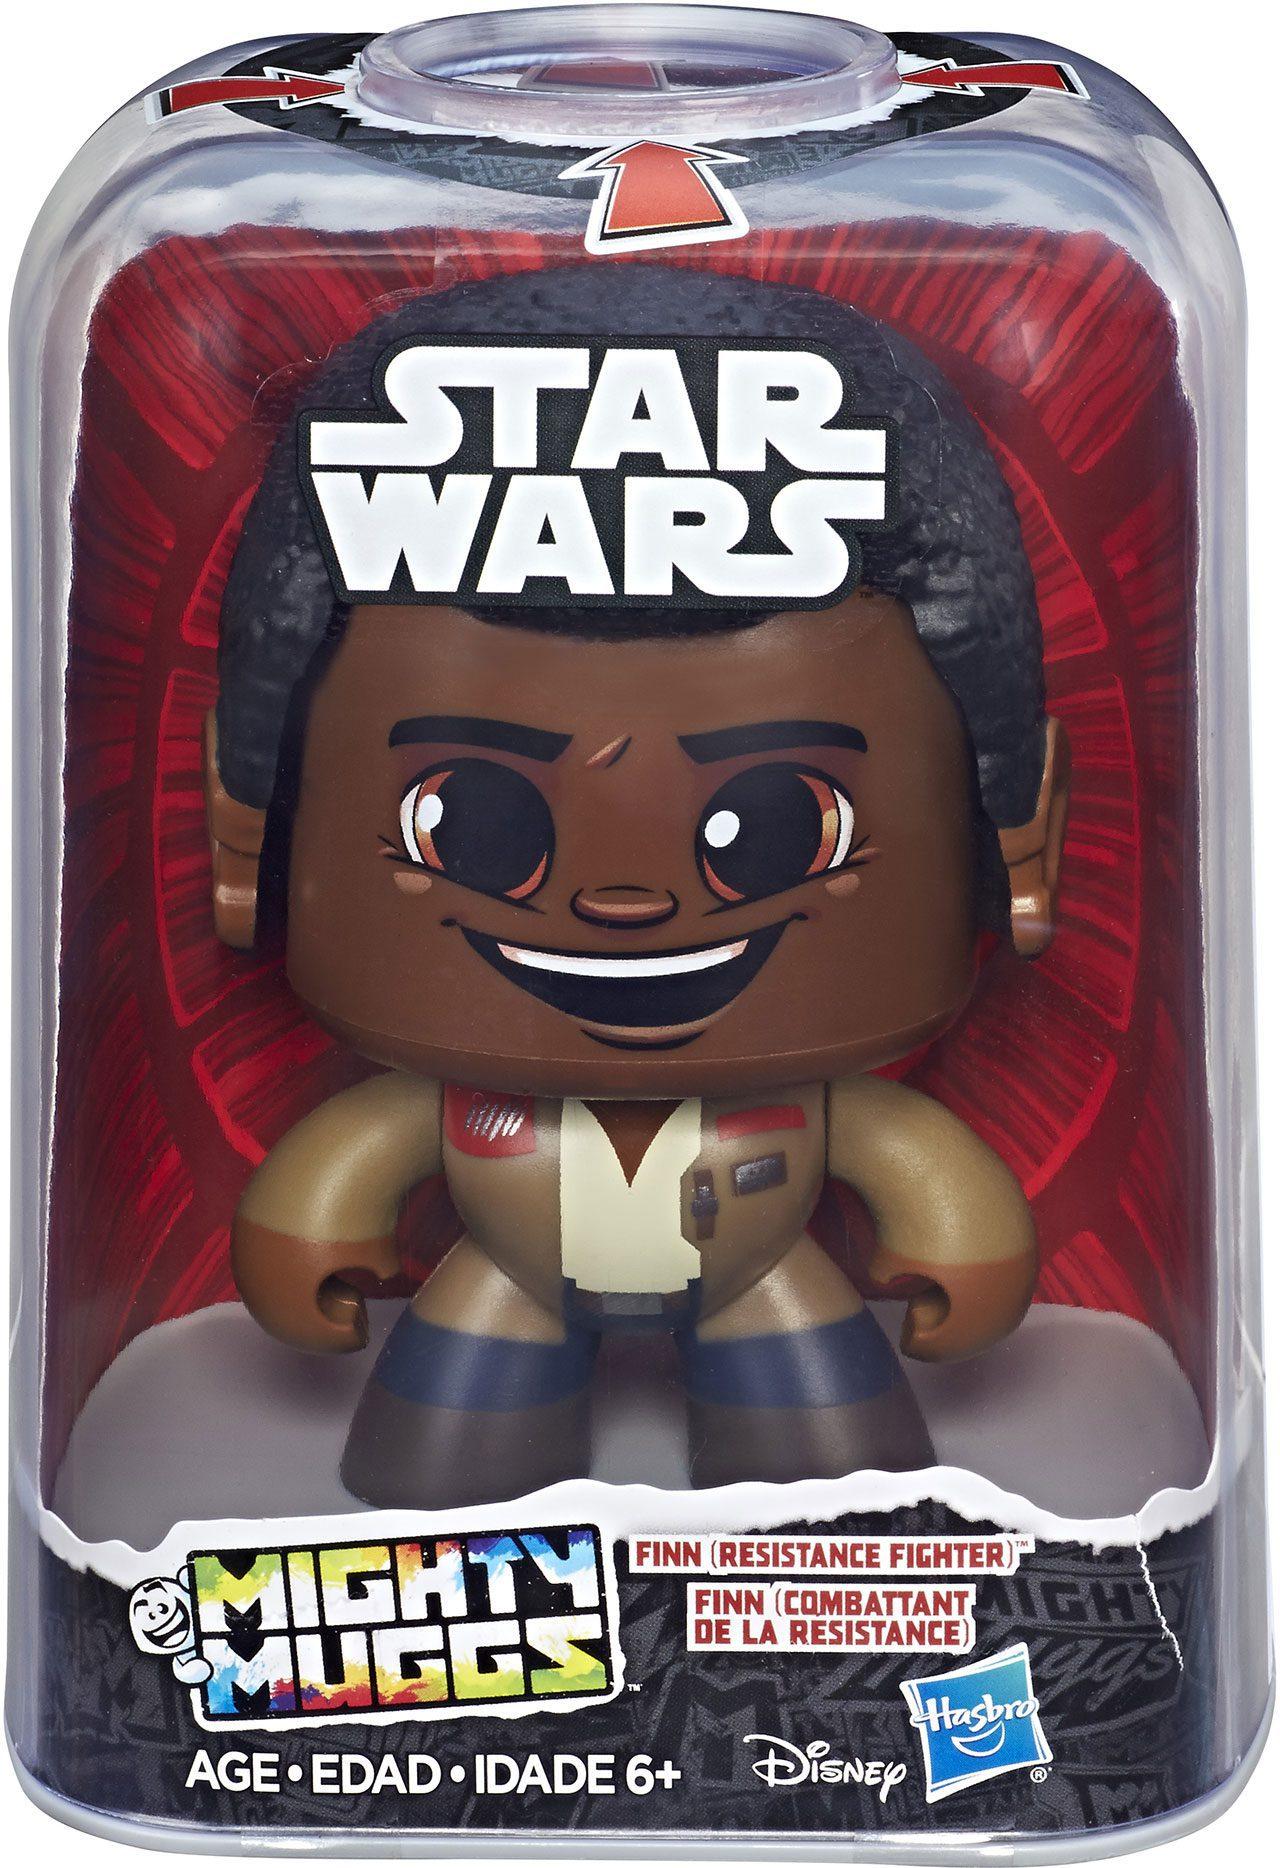 STAR WARS MIGHTY MUGGS Figure Assortment Yoda (in Pkg)